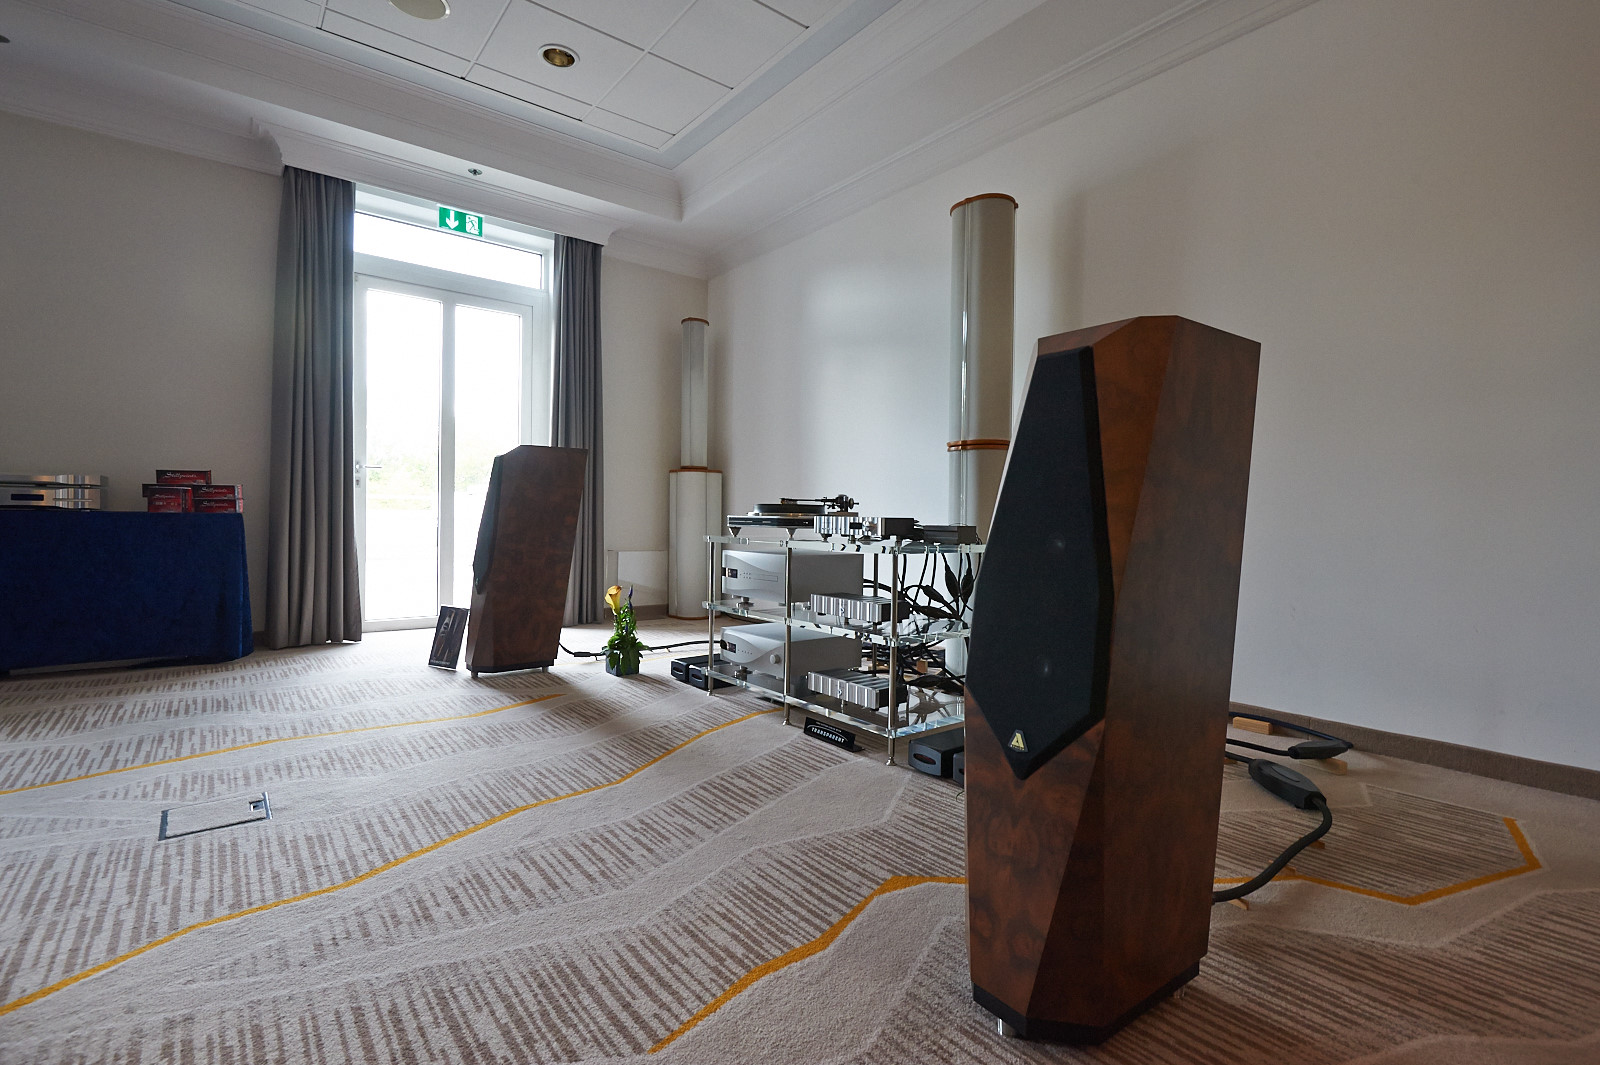 hifideluxe Messe München 2014: Avalon Transcendent - Spiral Groove SG1.1 - My Sonic Lab The Eminent GL - dCS Vivaldi VTT + Vivaldi DAC - Jeff Rowland Capri S2 + M125 - Stillpoints + Transparent Zubehör